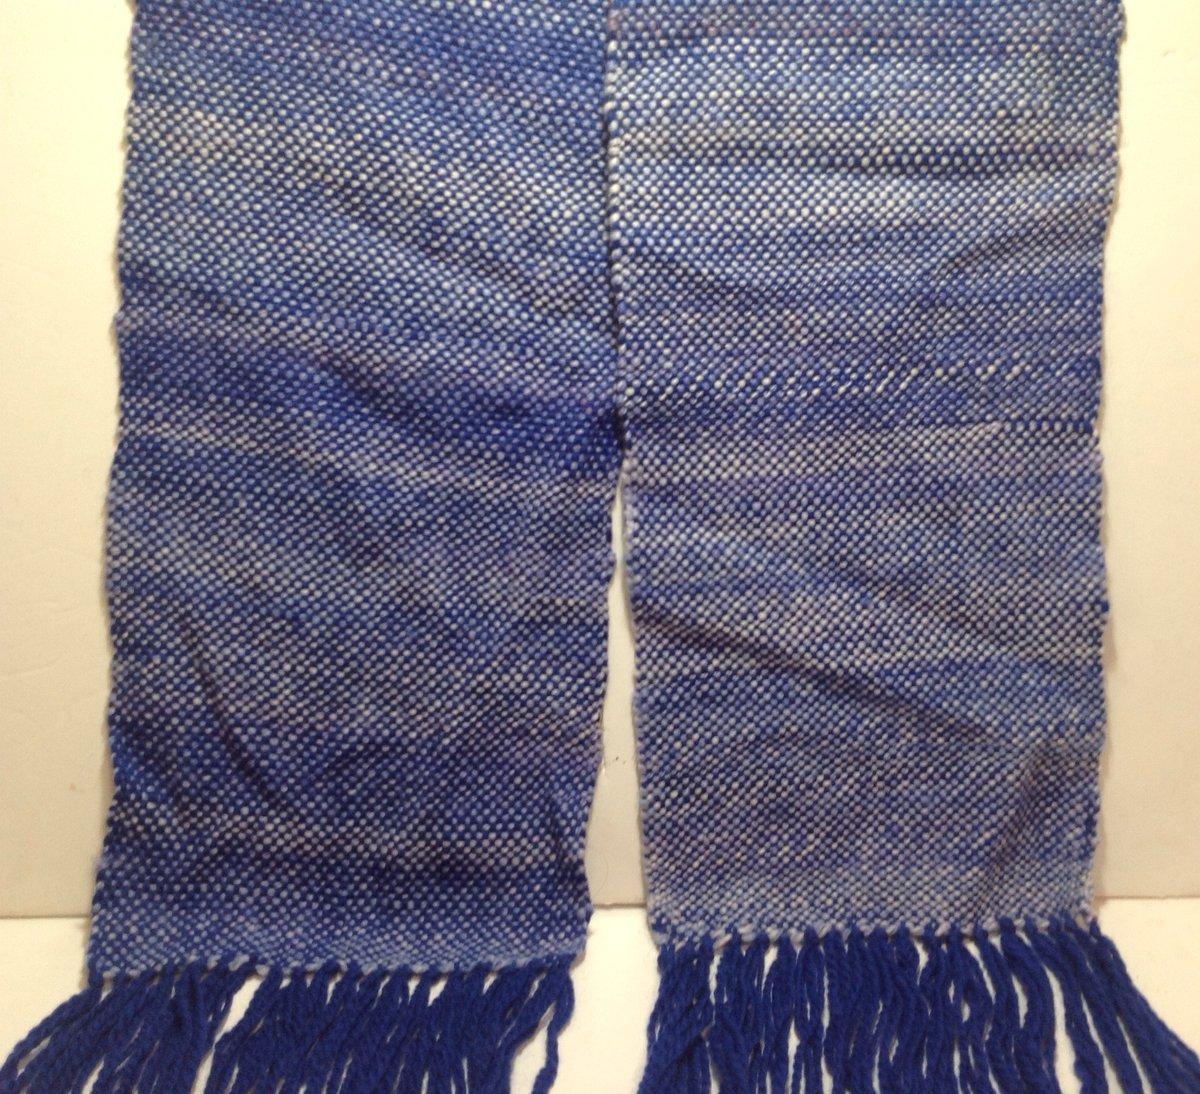 Image of Handmade Woven Merino Scarf, Neck Scarf, Winter Scarf, Woman Scarf, Men's Scarf